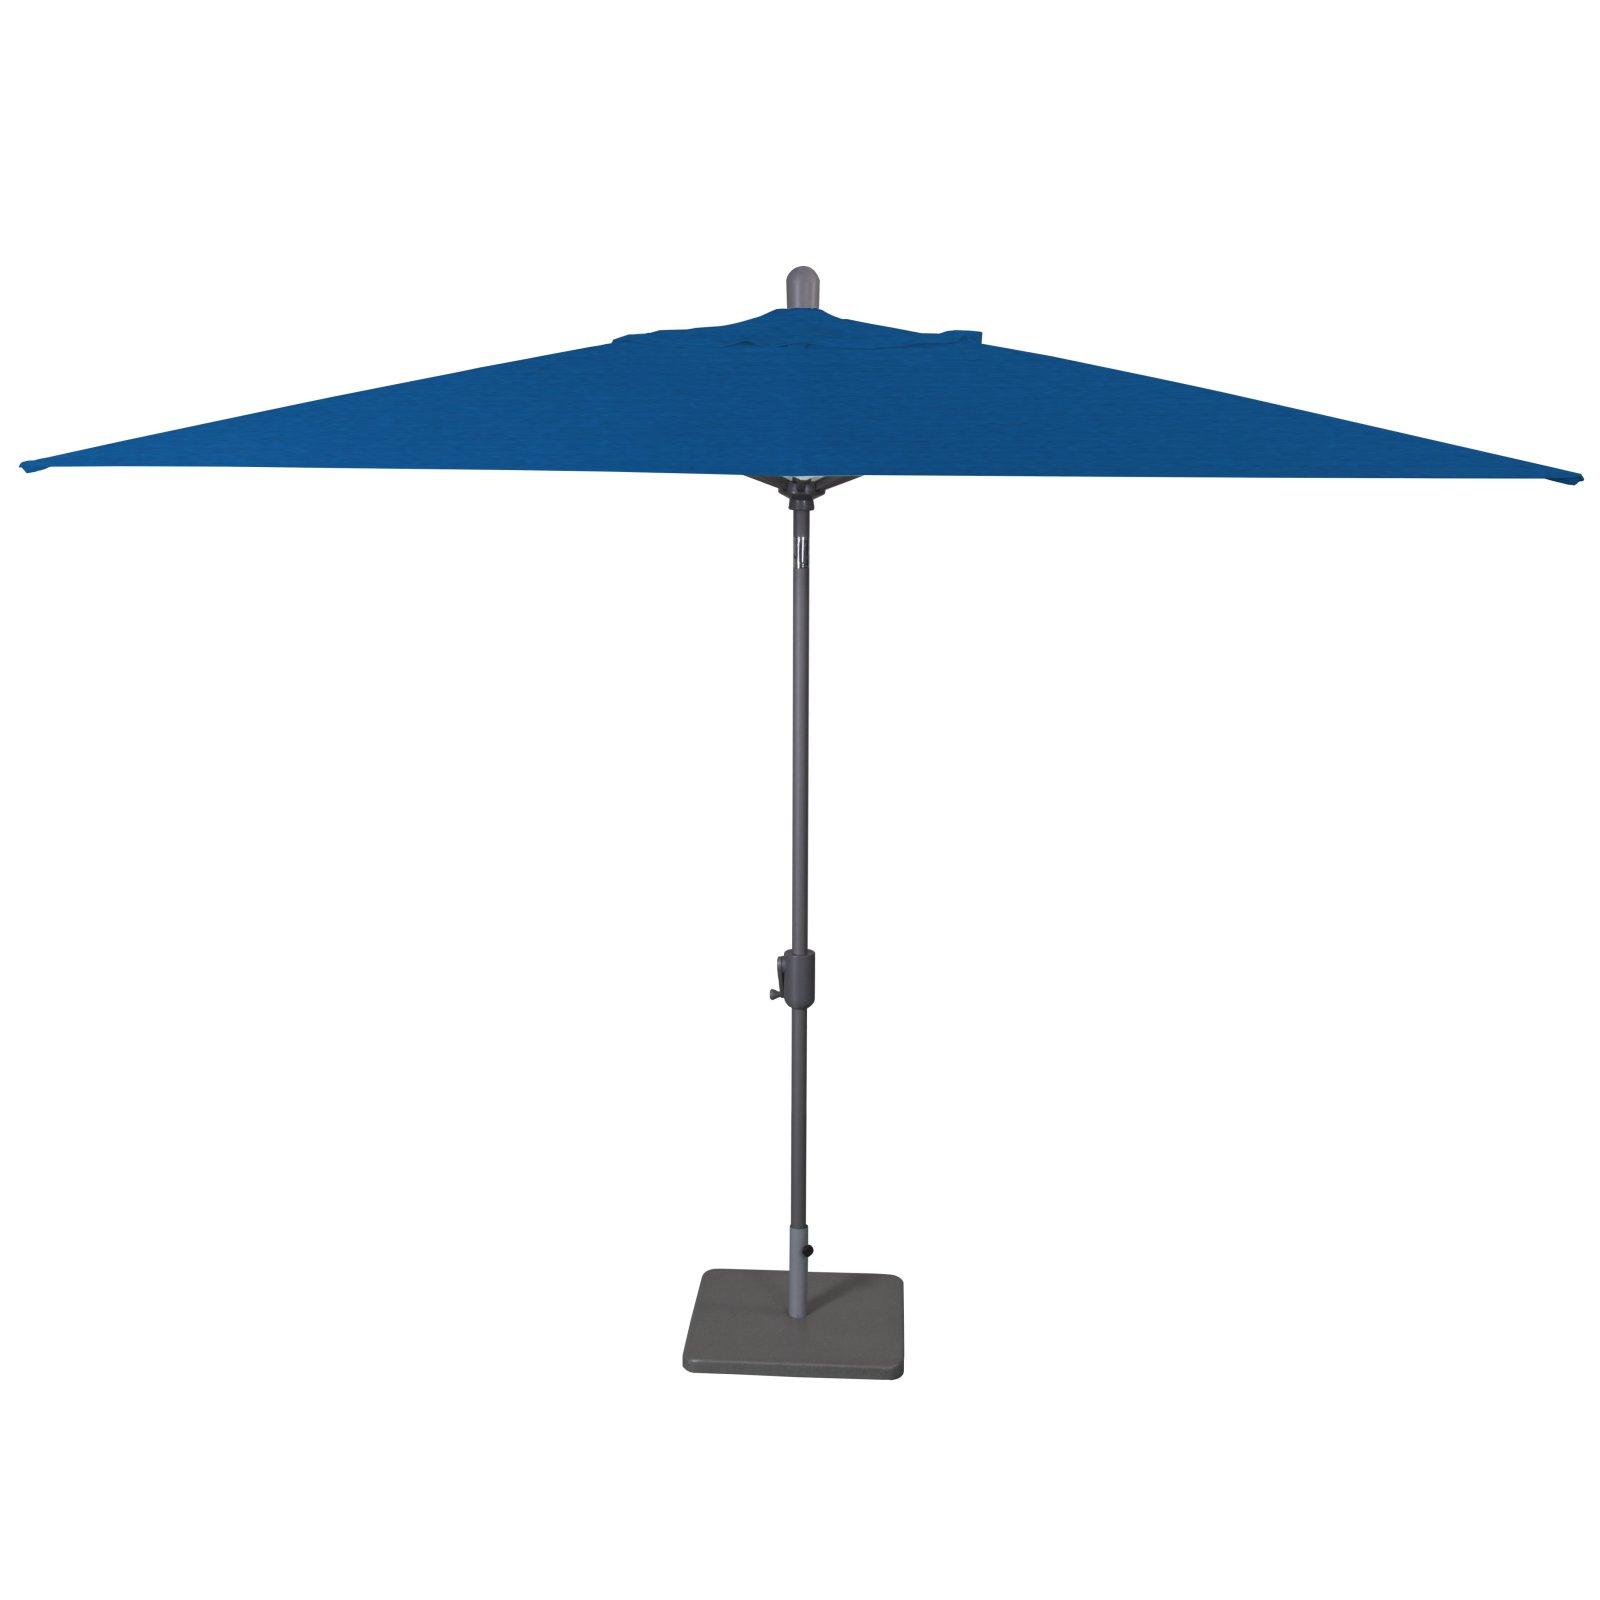 Preferred Mullaney Market Umbrellas In Amauri Laguna Cove 10 Ft. X 6.5 Ft (View 19 of 20)